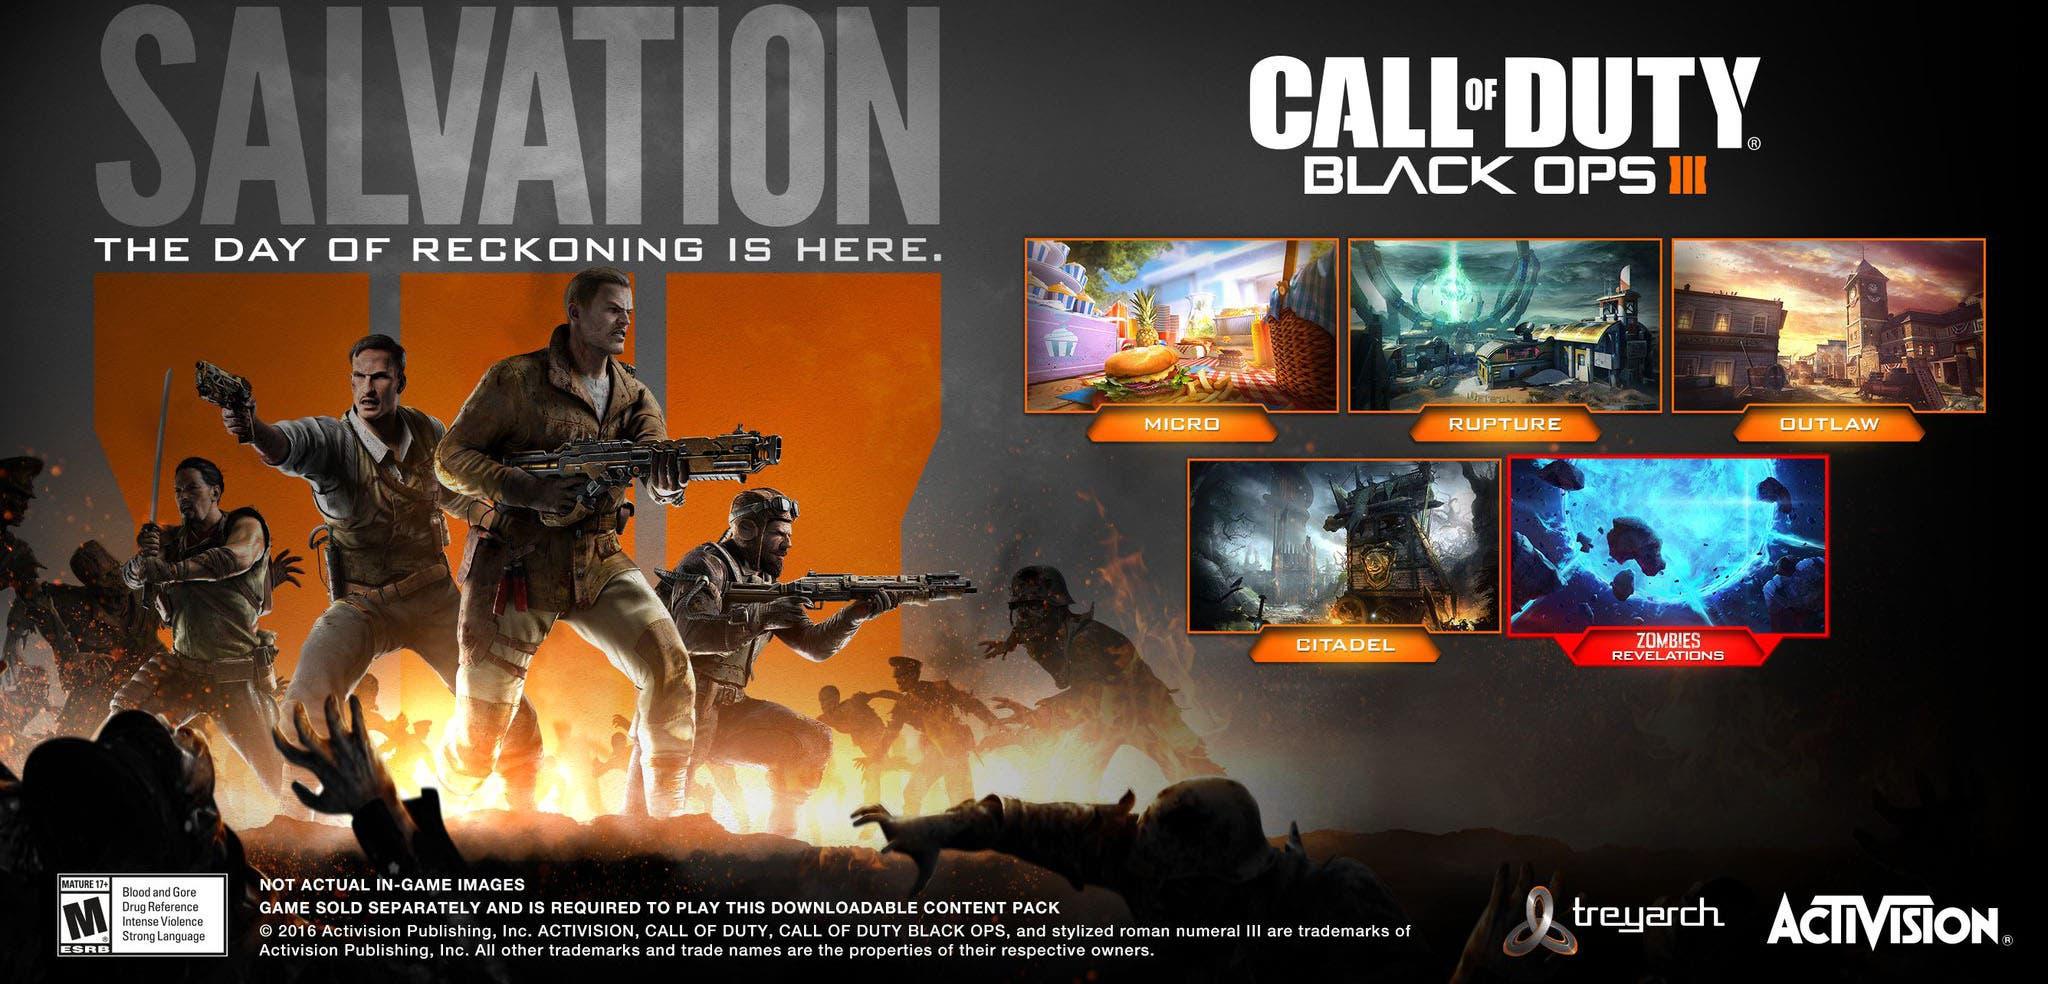 último DLC de Call of Duty: Black Ops III